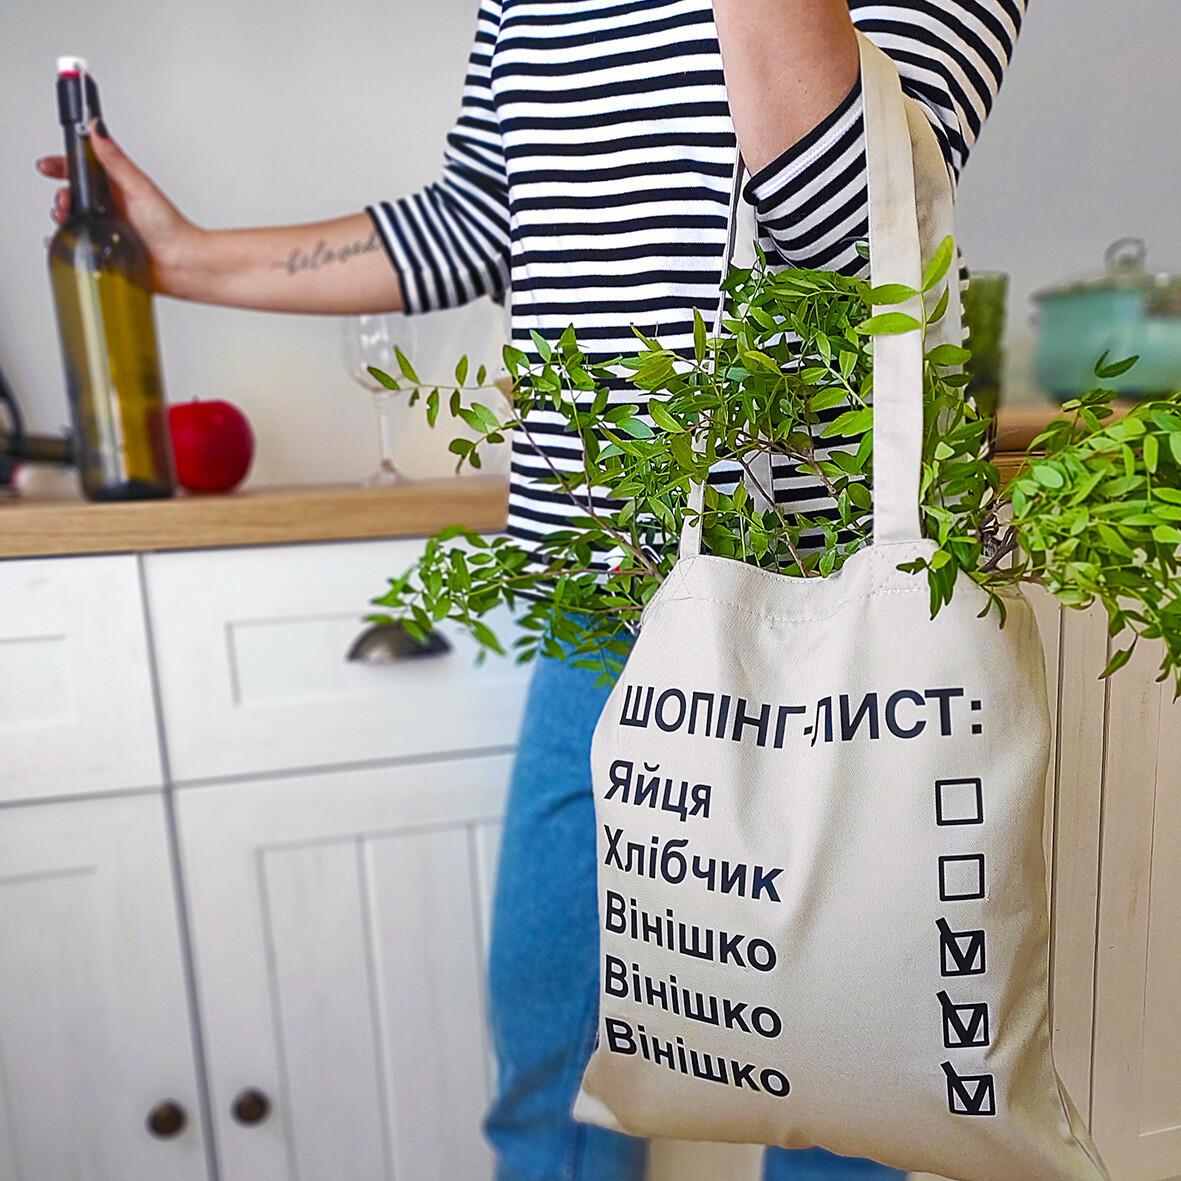 Еко сумка шопер Market Шопінг-лист, Вінішко